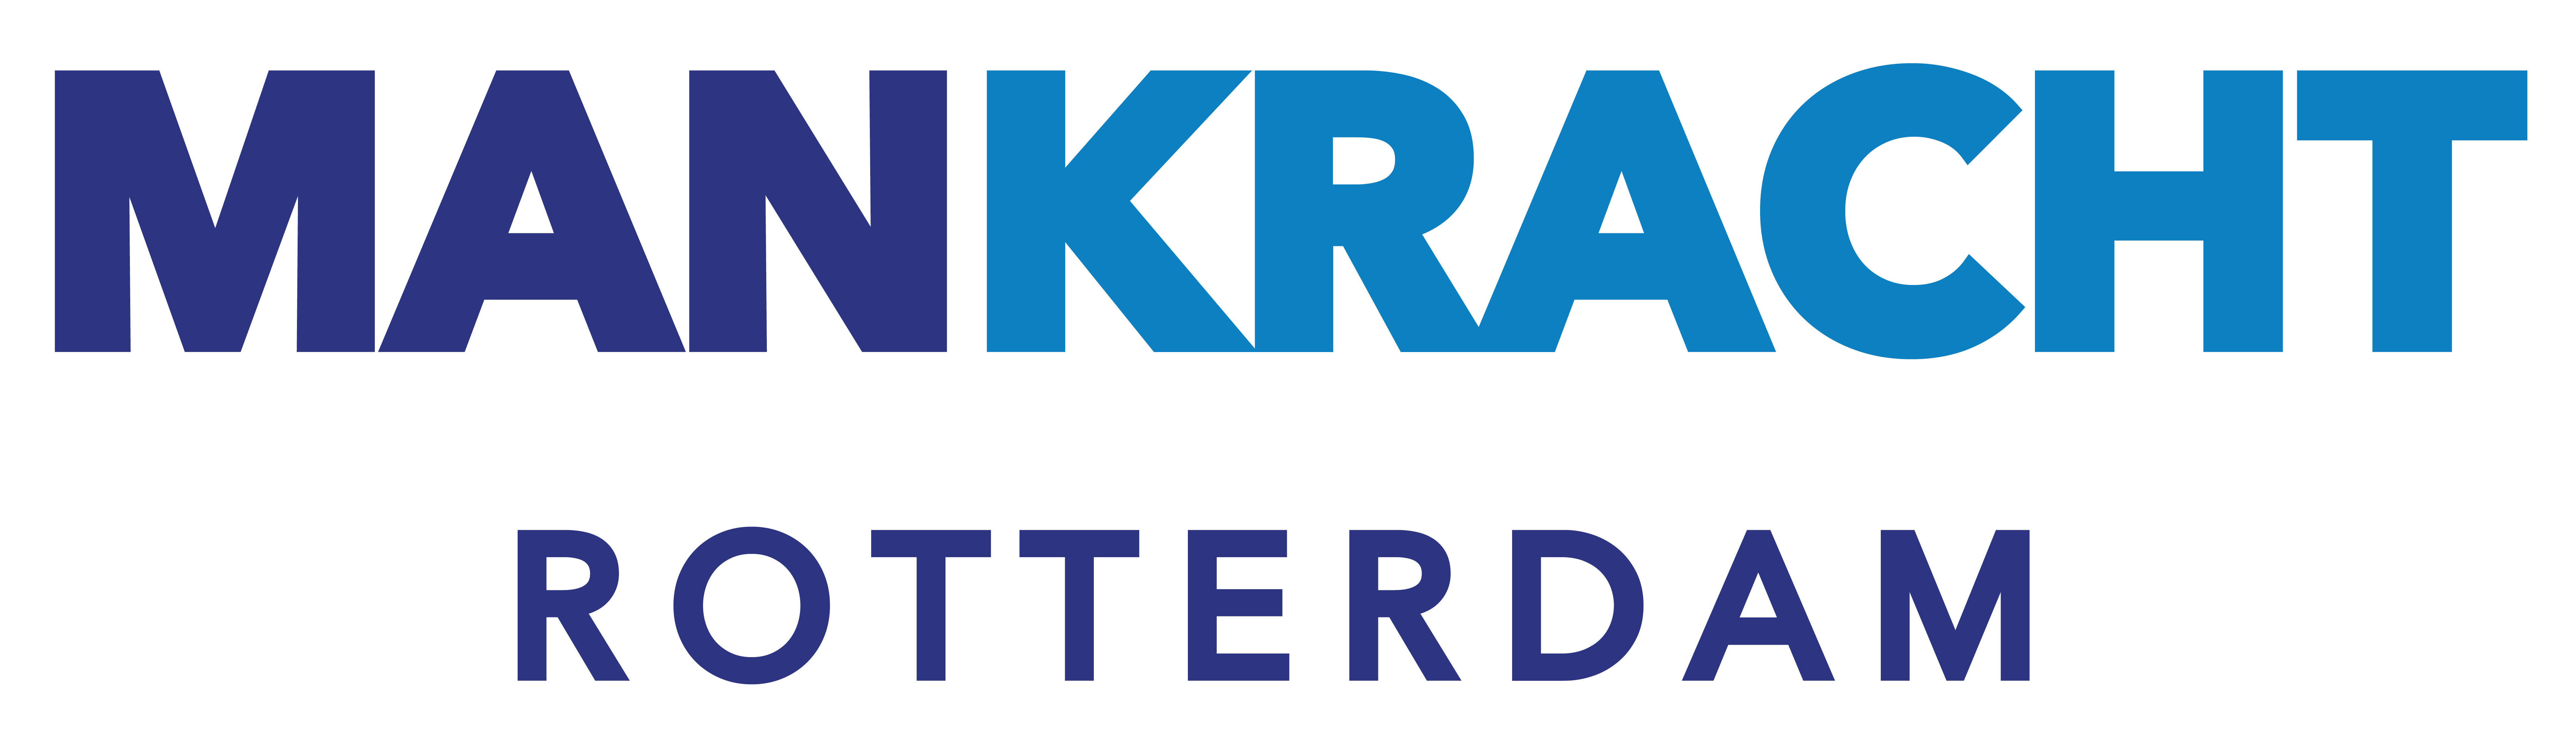 Mankracht Rotterdam